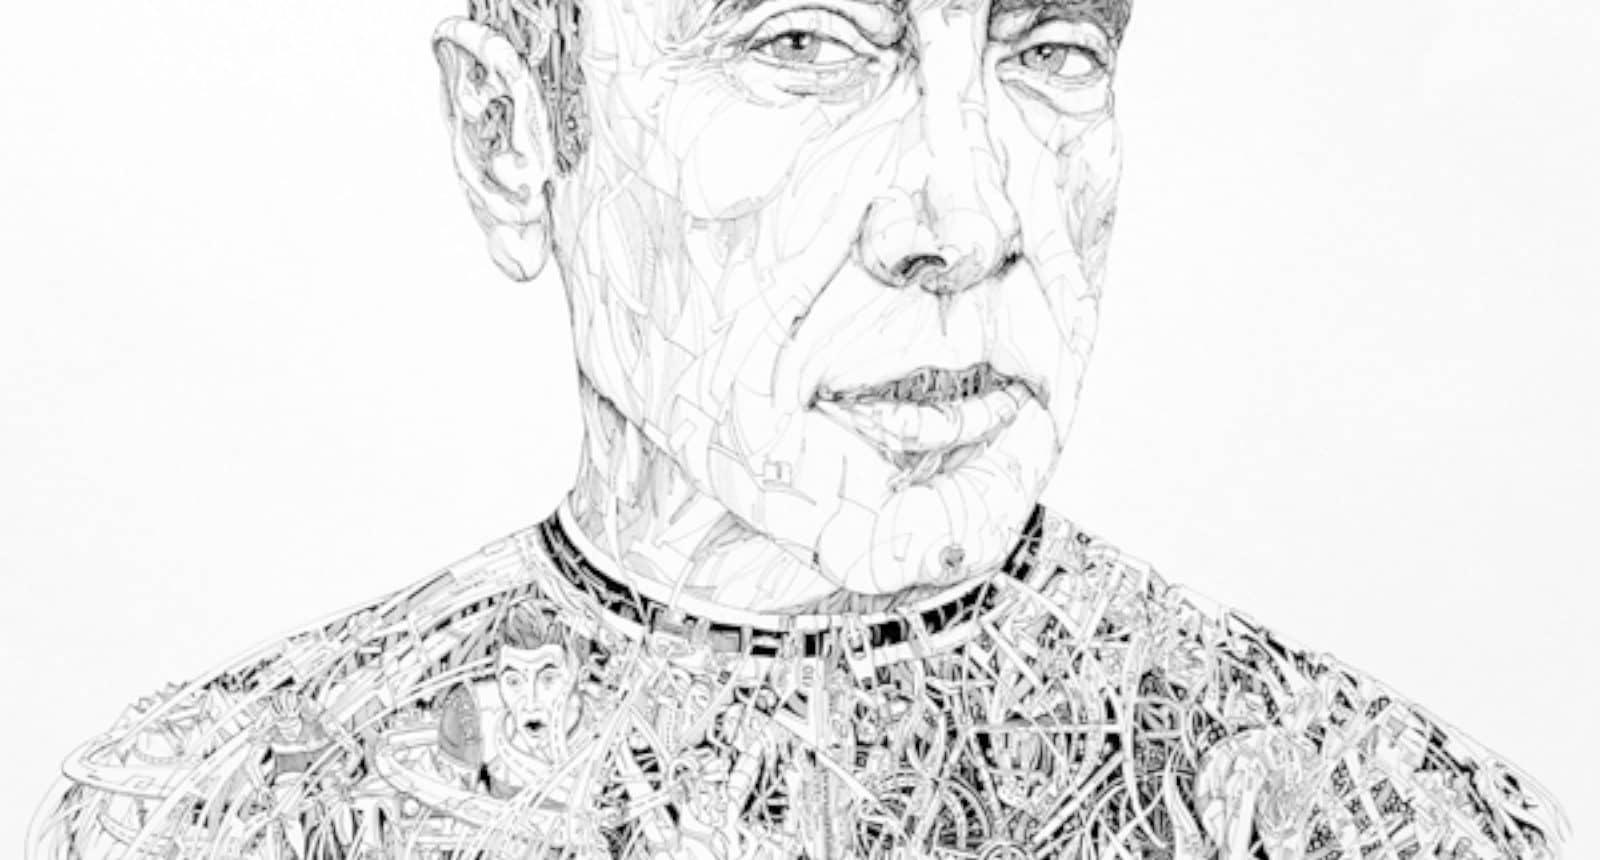 Eddy Merckx Strook